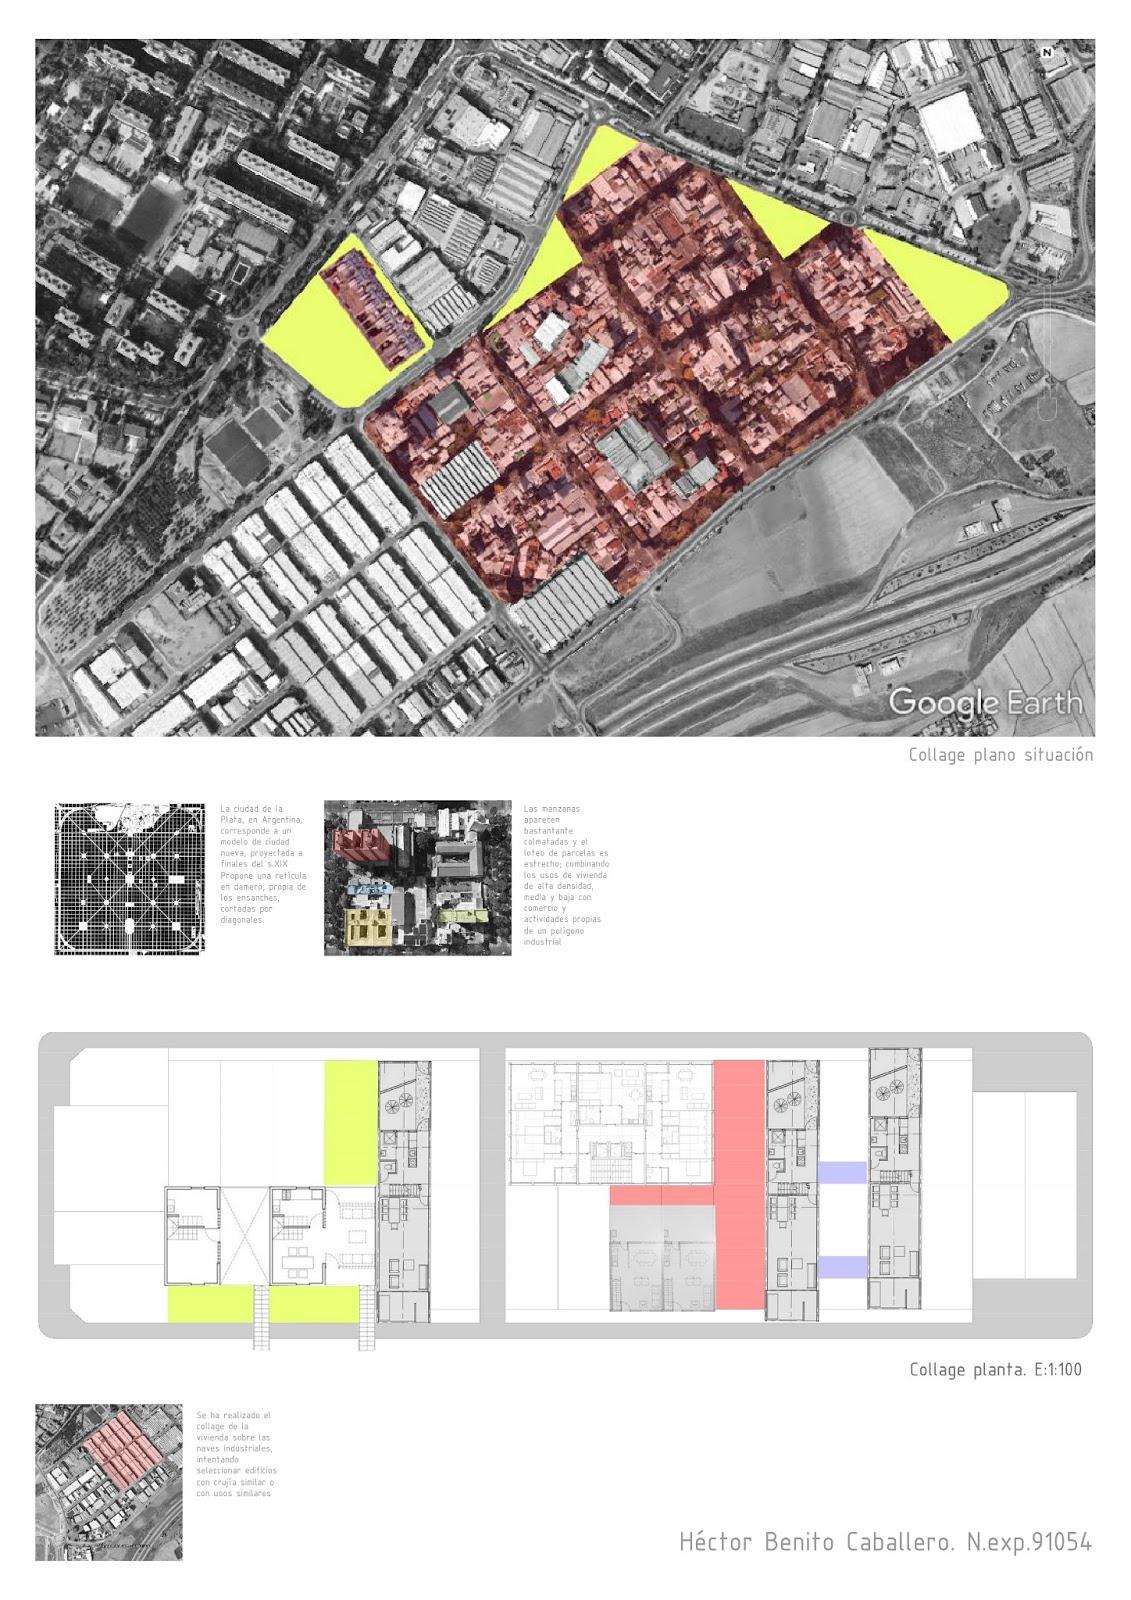 Proyectos 8 U.D Herreros: Primer collage (Planta)